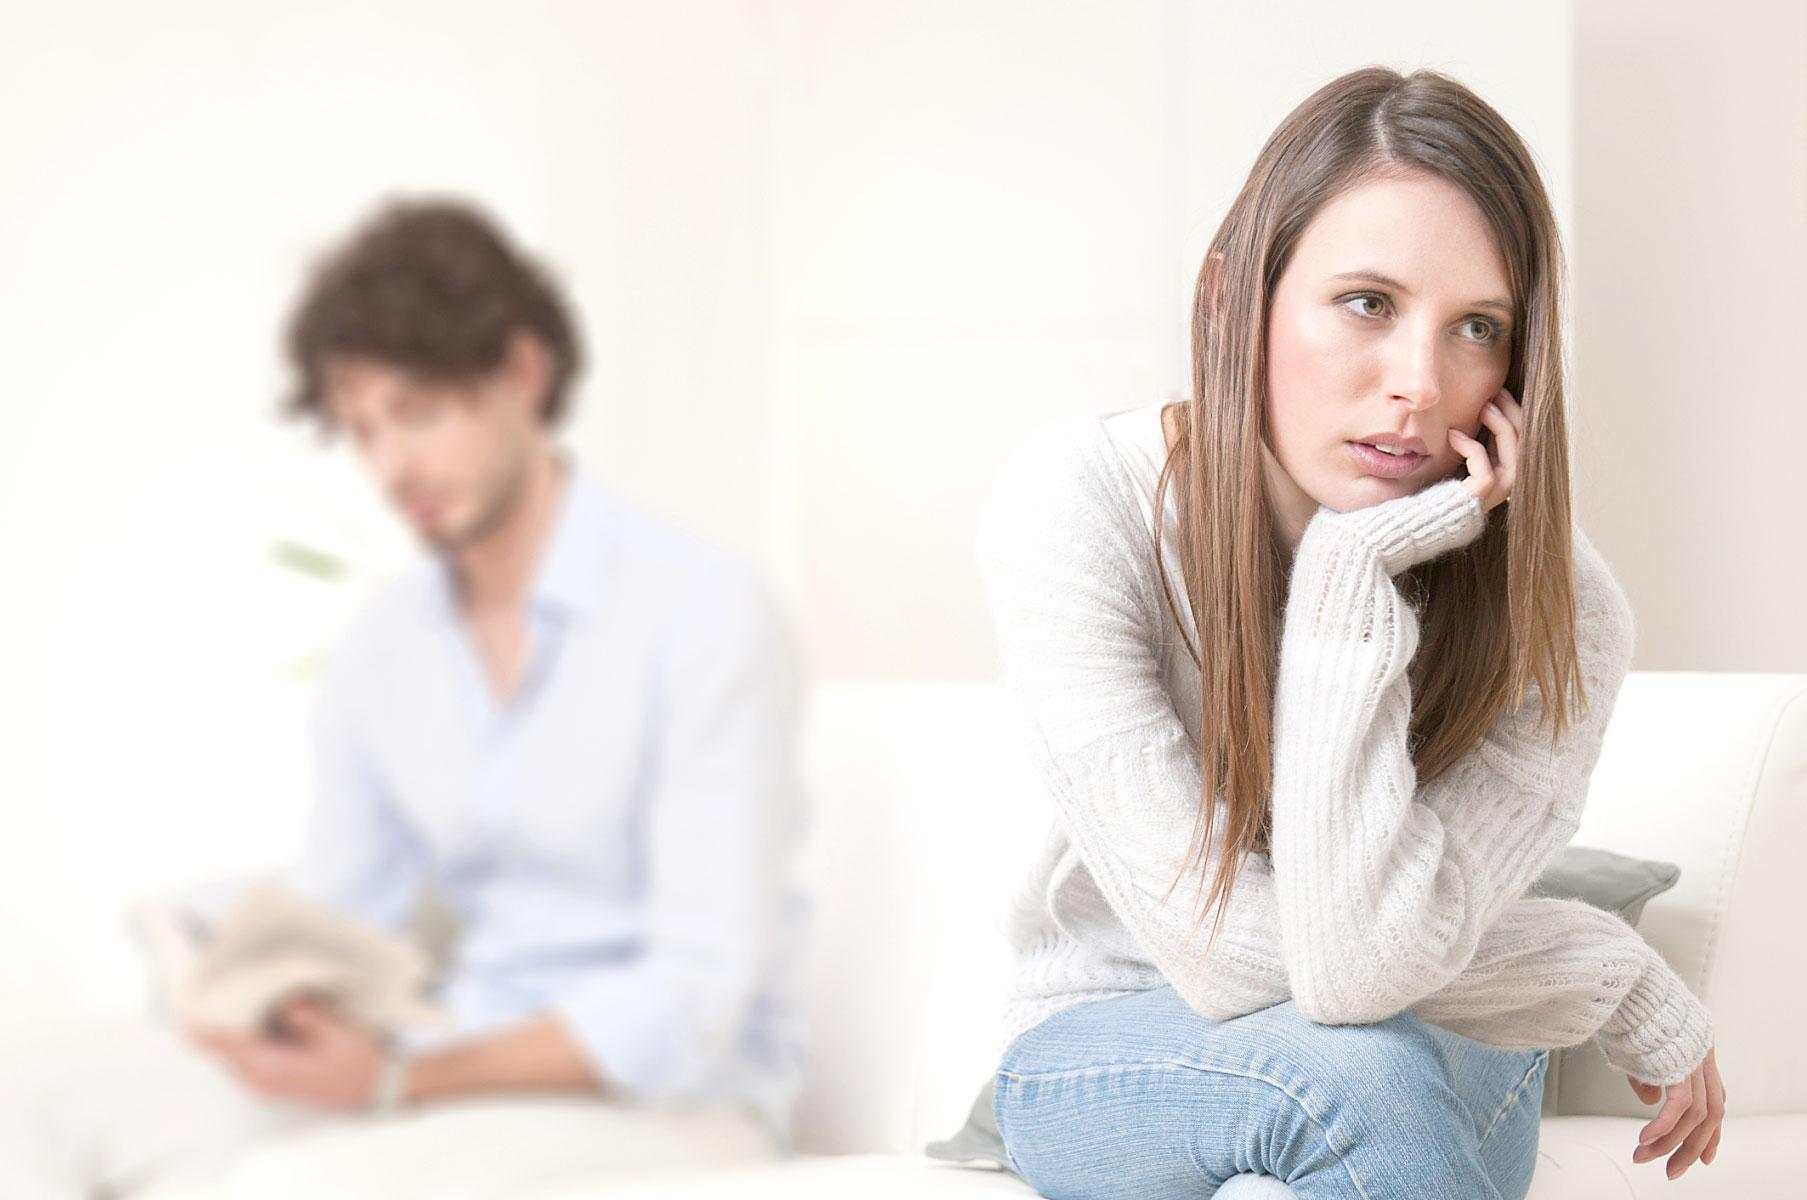 Why do men stay in bad relationships longer than women